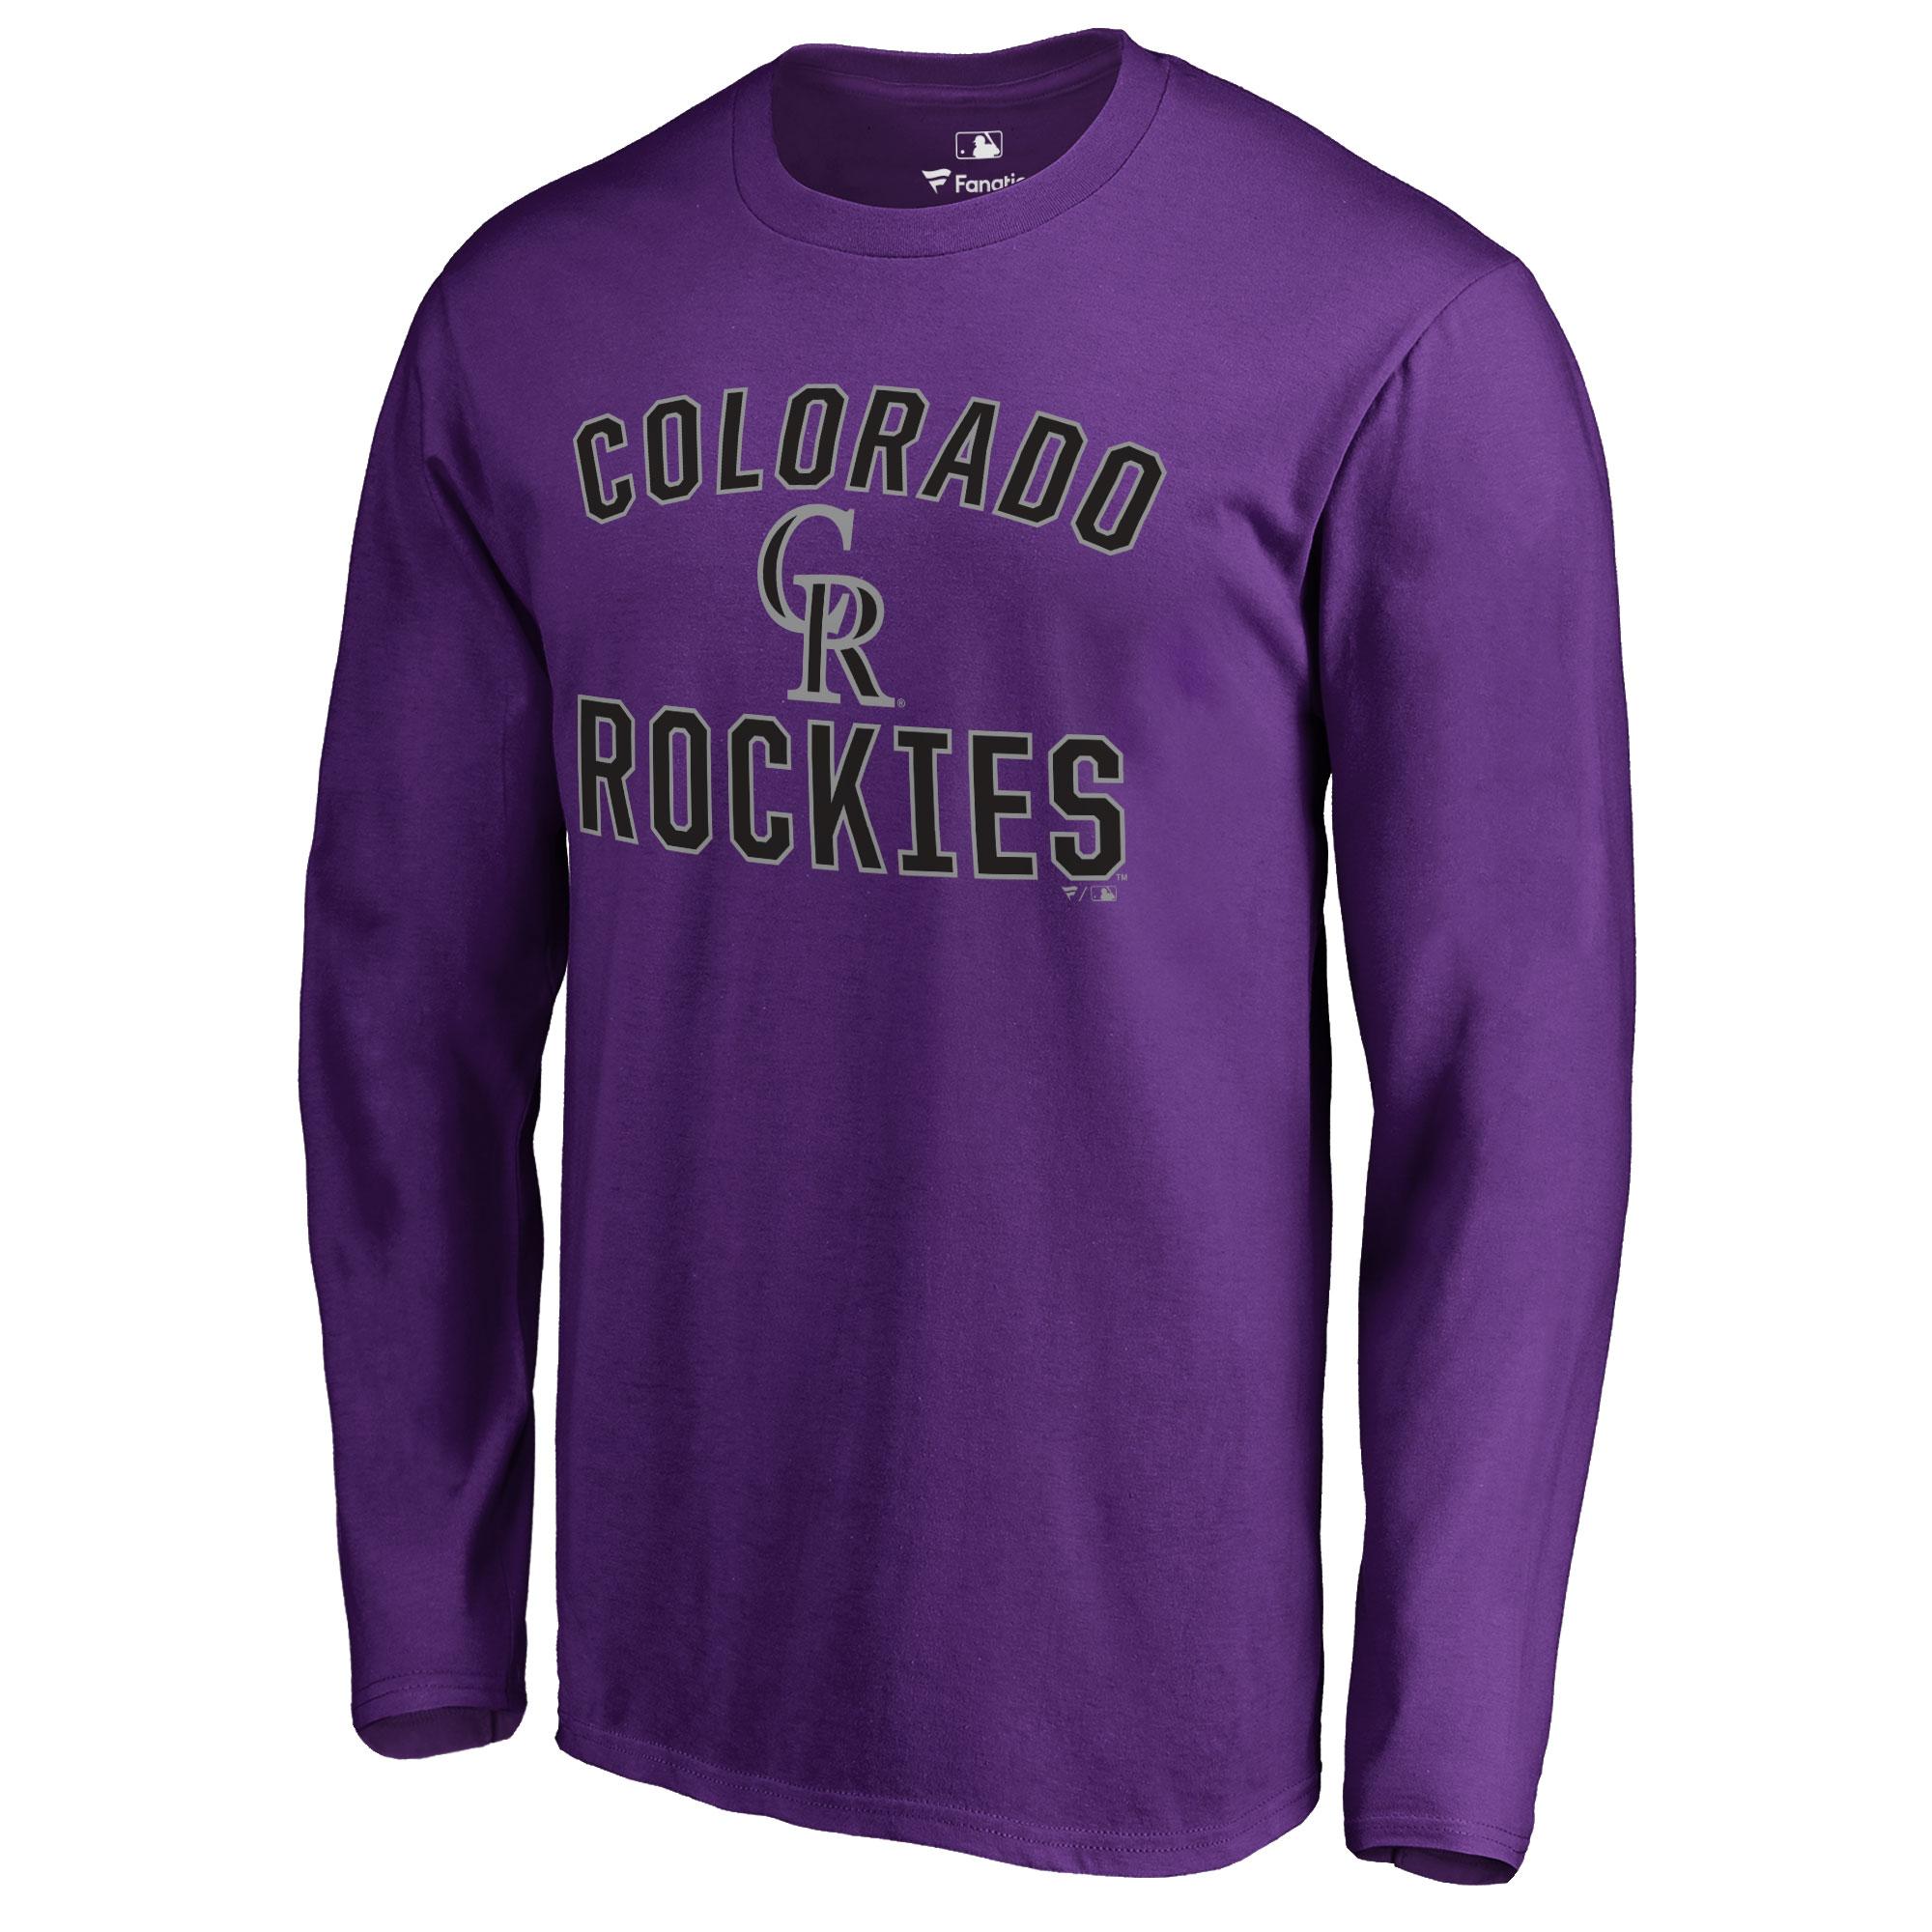 Colorado Rockies Victory Arch Long Sleeve T-Shirt - Purple